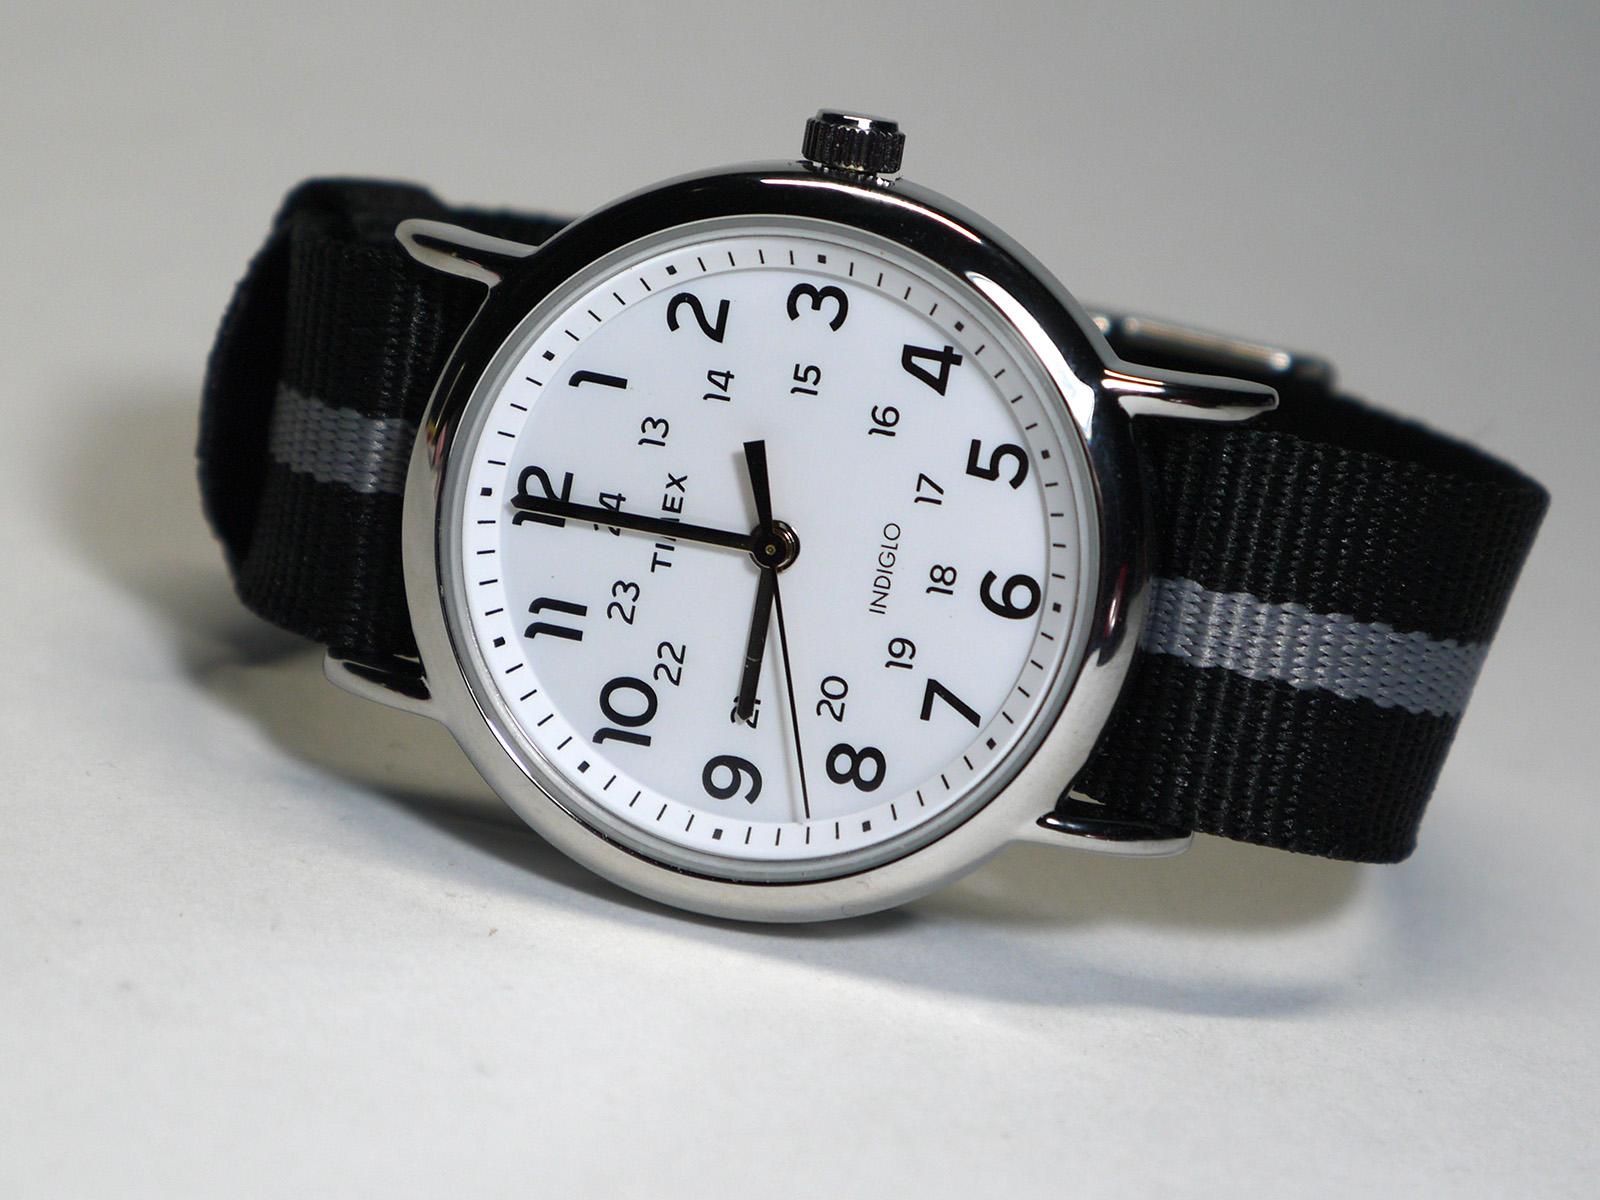 Timex Tw2p72200 Weekender Watch ⋆ High Quality Watch Gallery